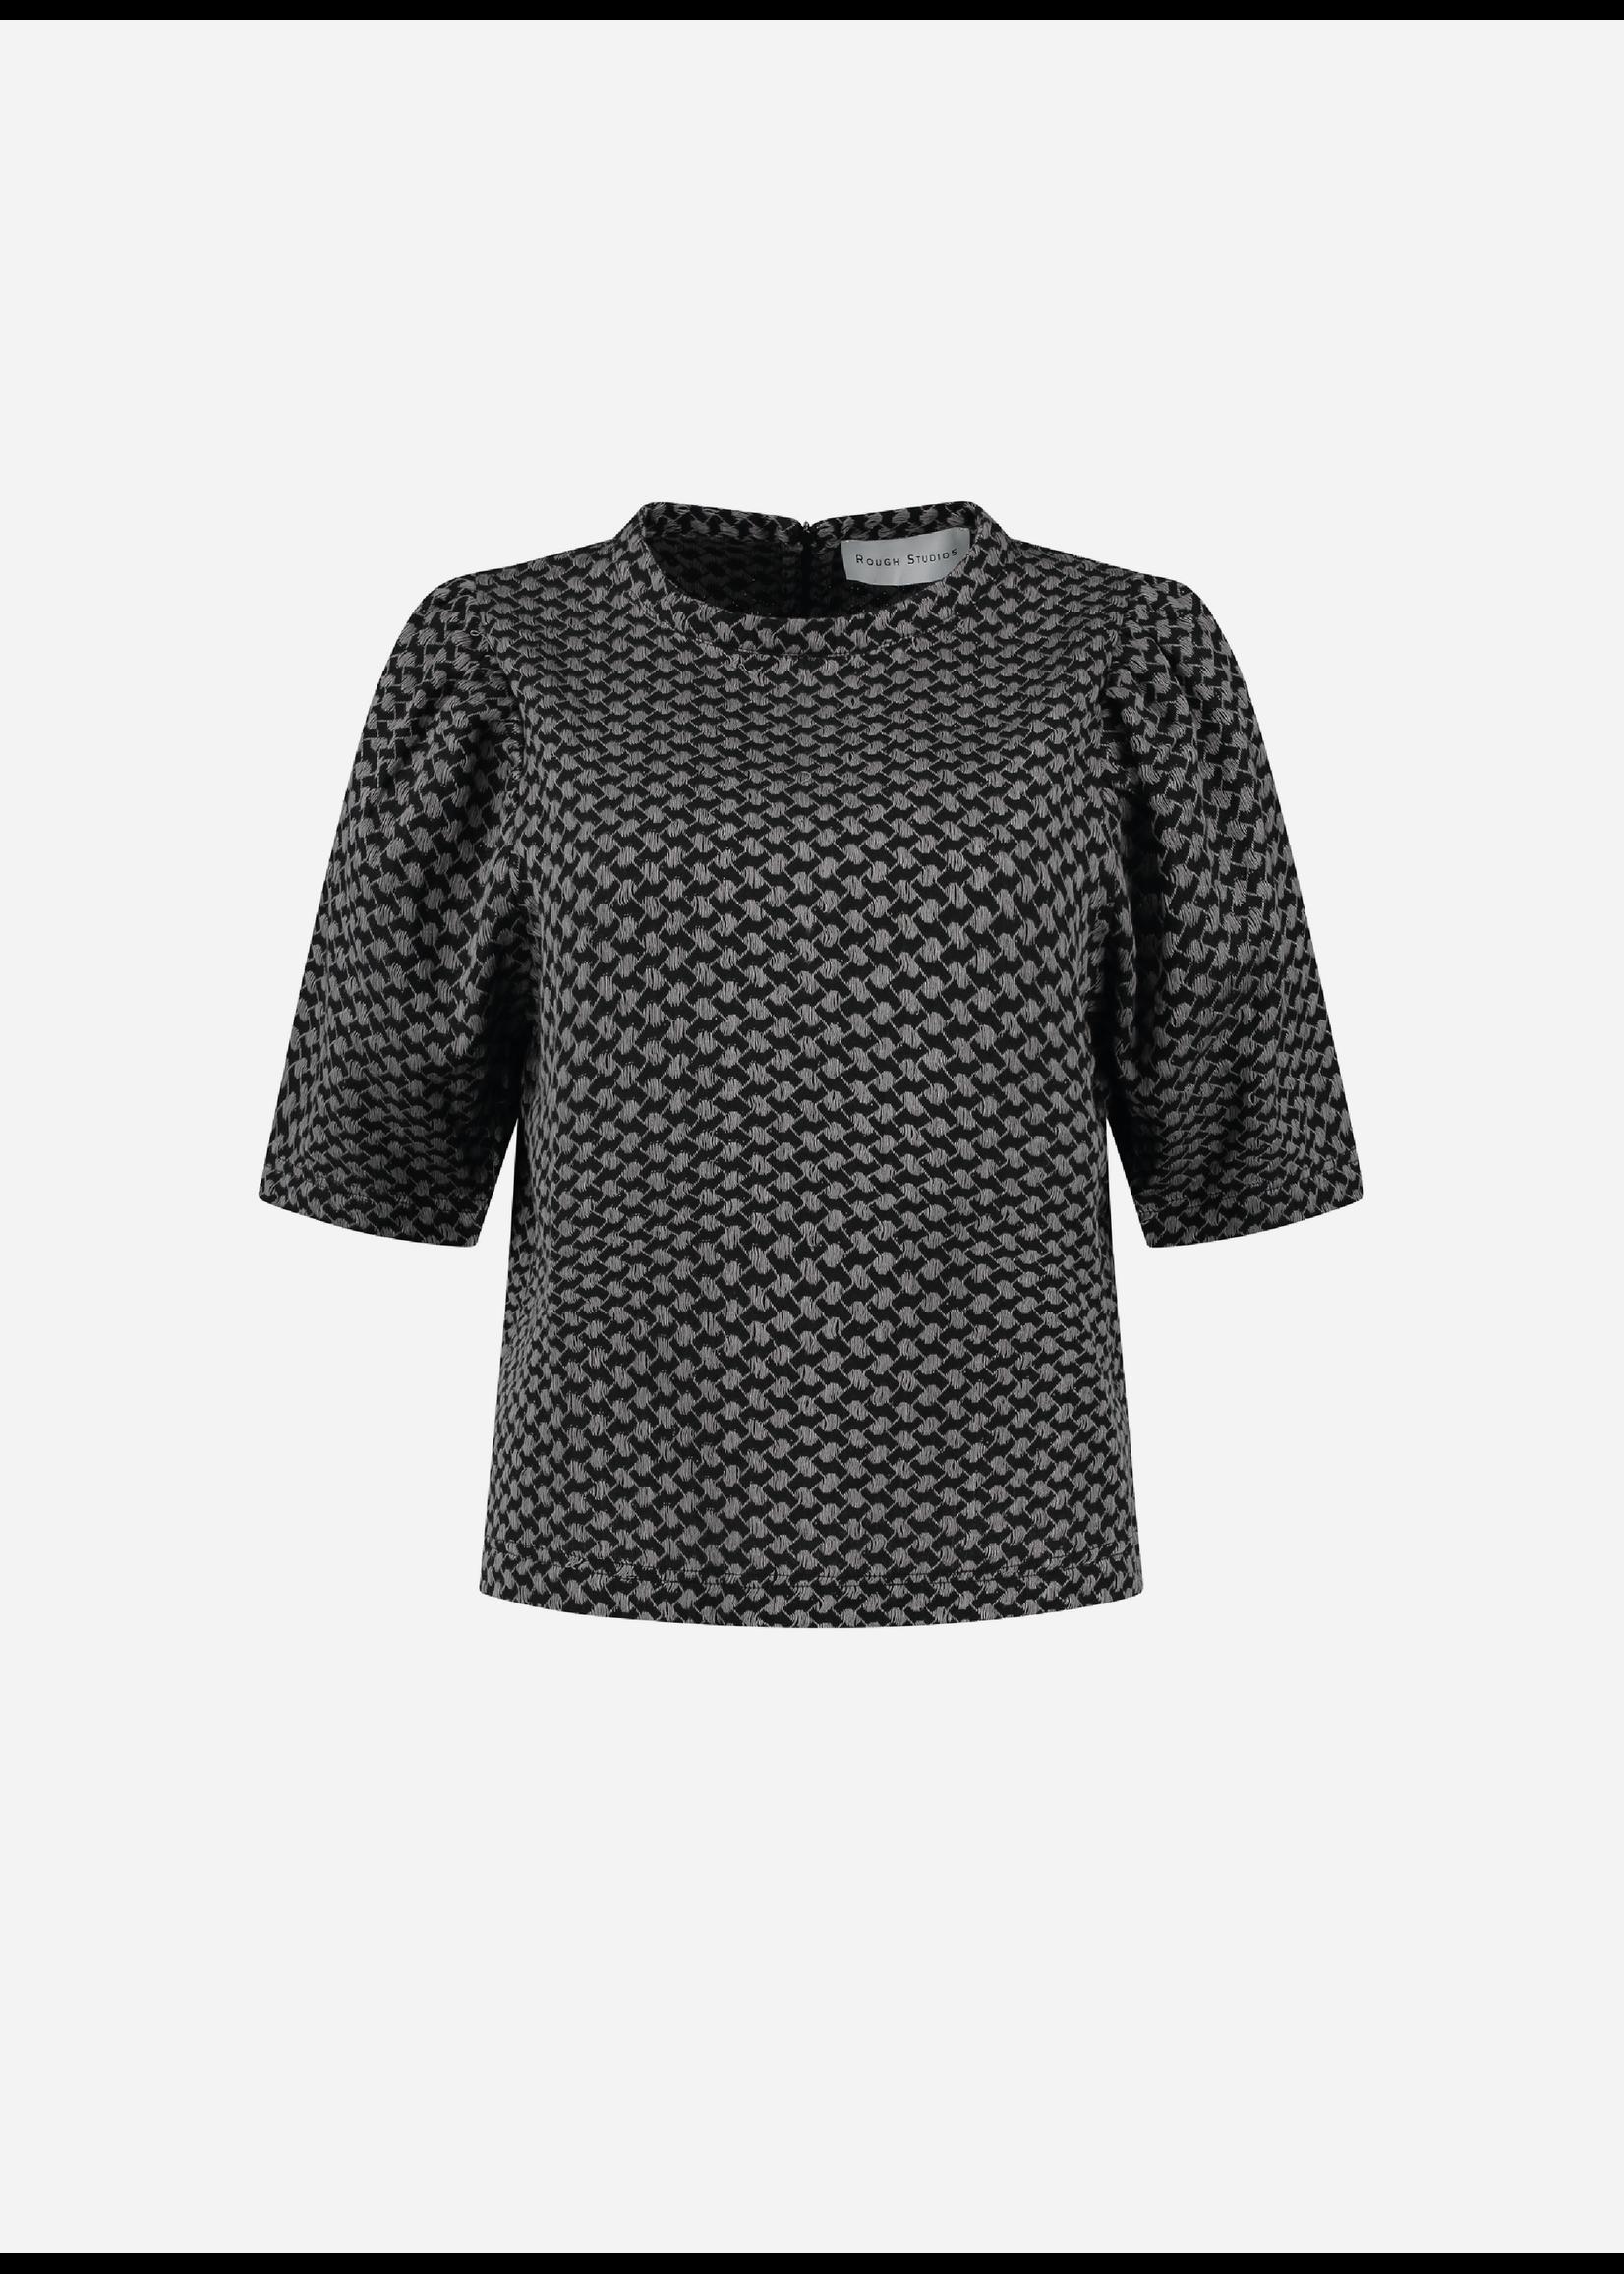 Rough Studios Simone shirt grey/black